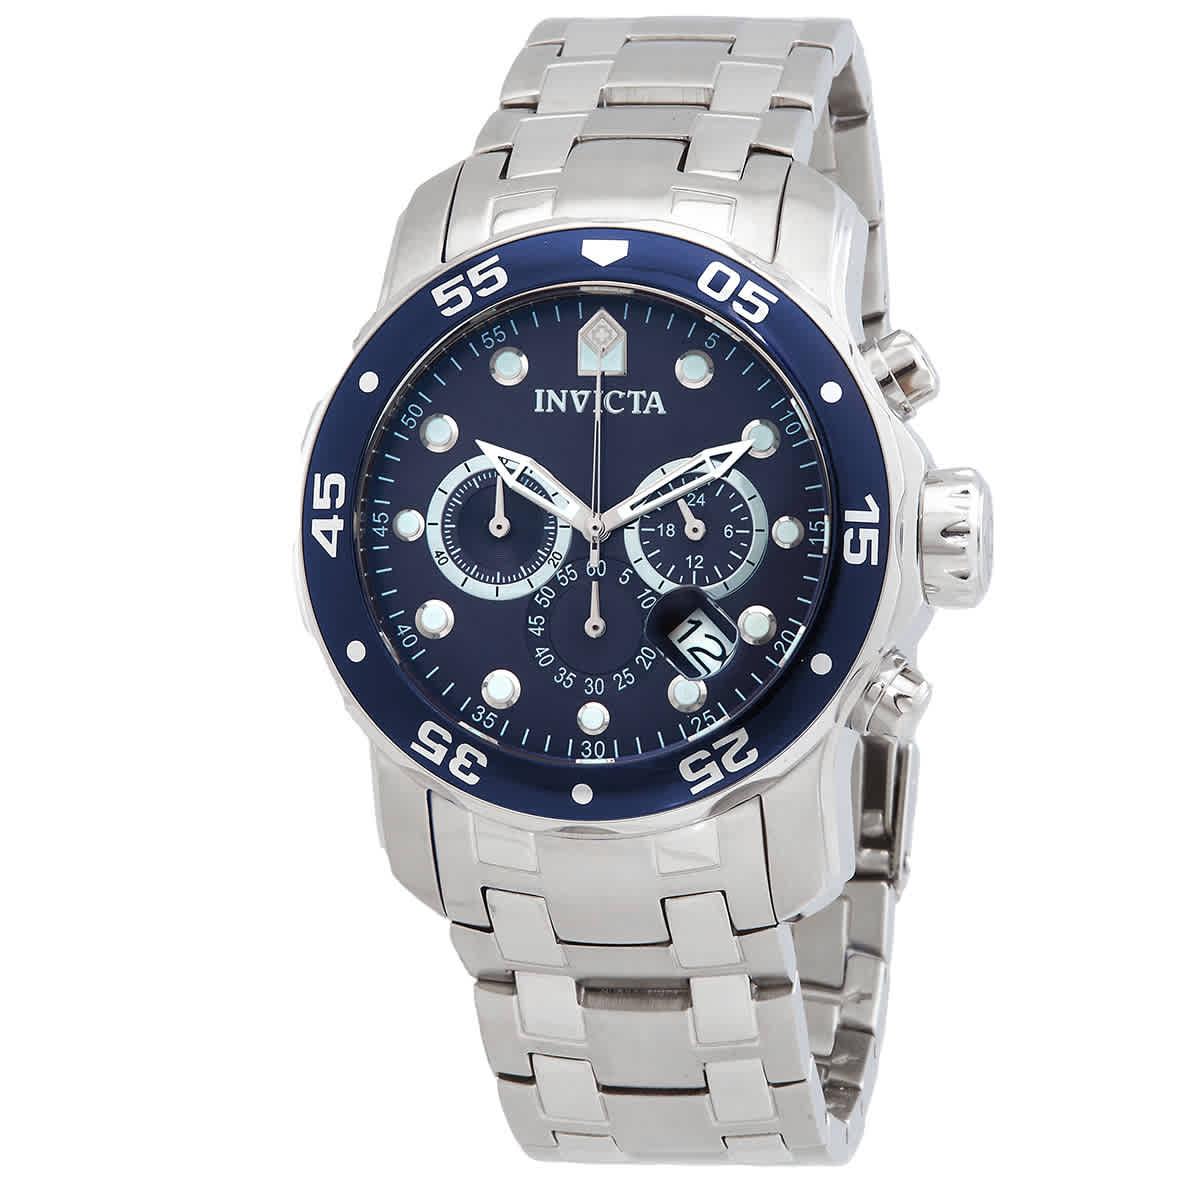 Invicta Pro Diver Chronograph Blue Dial Mens Watch 0070 In Metallic